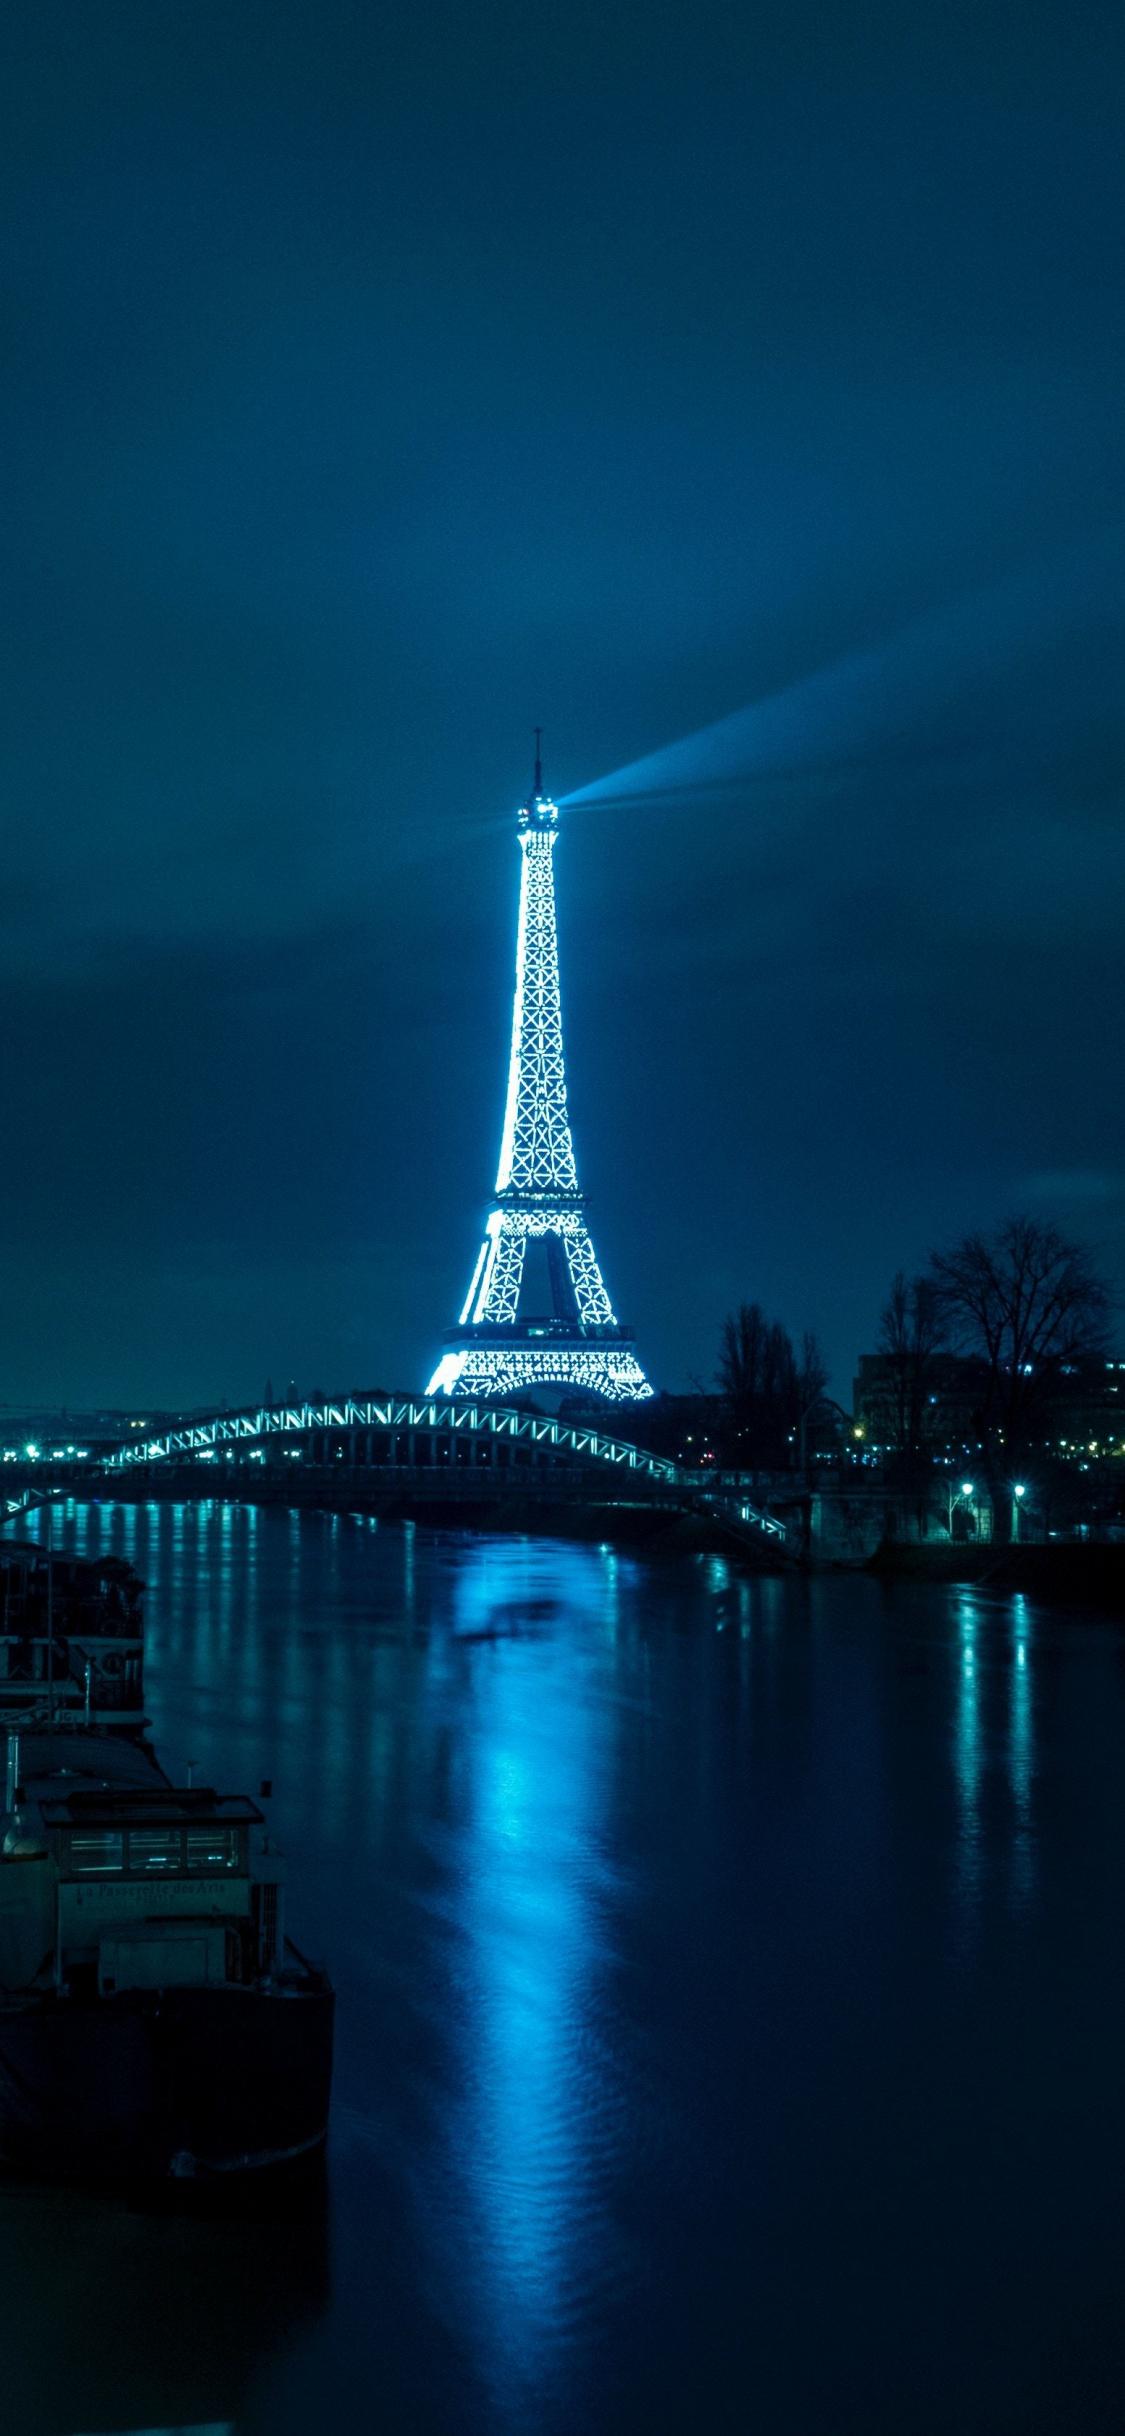 Download 1125x2436 Wallpaper Paris Eiffel Tower Night City Iphone X 1125x2436 Hd Image Background 5587